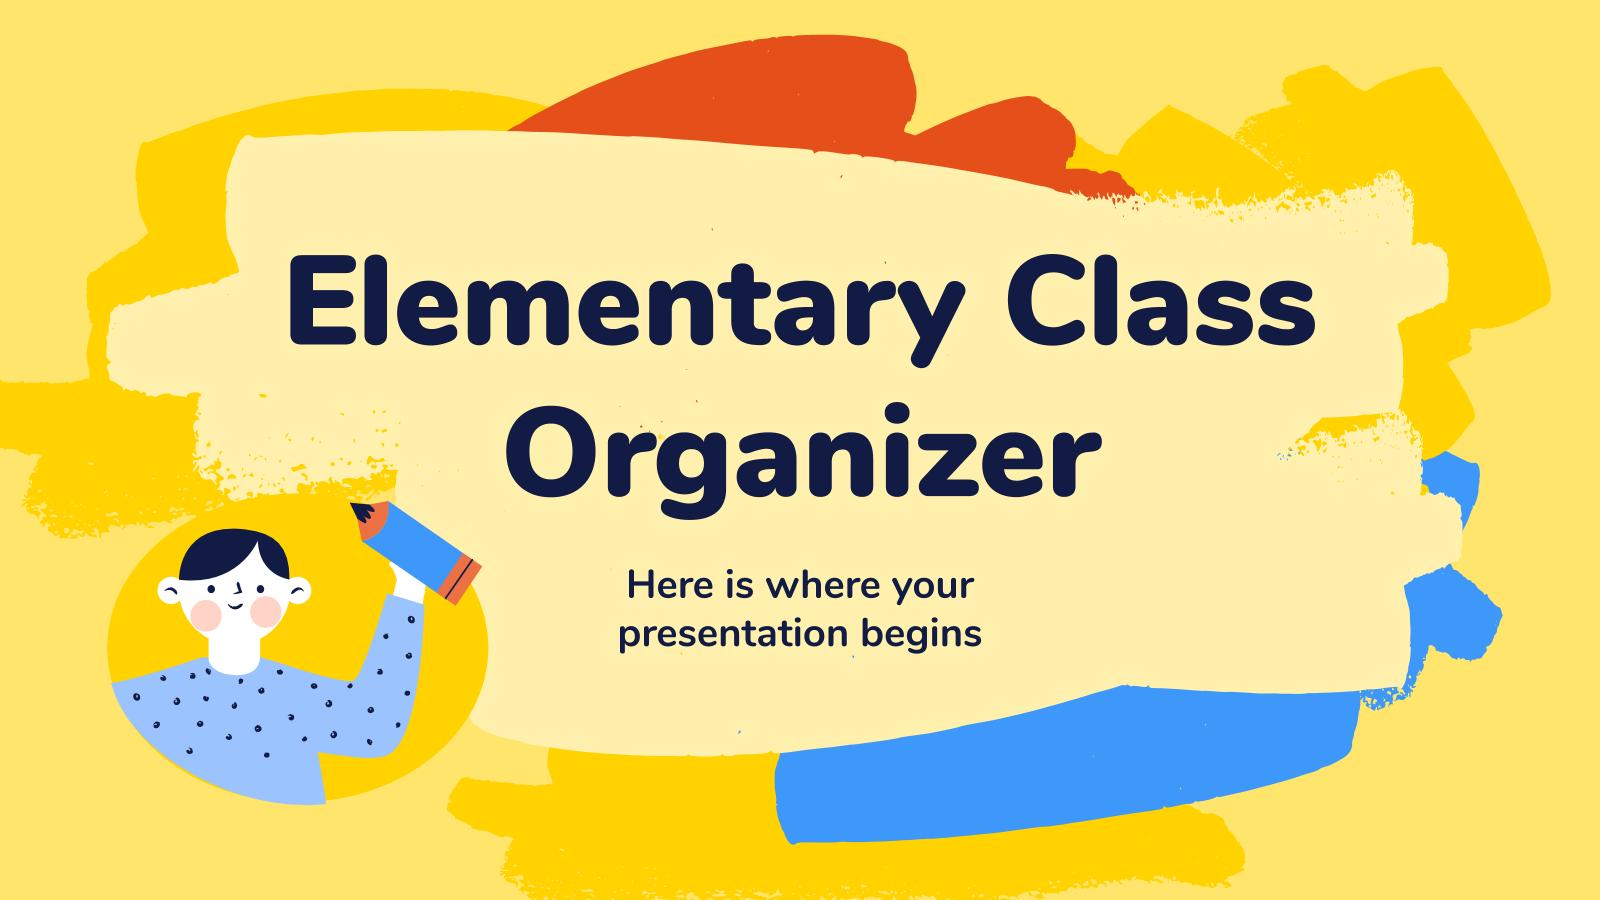 Elementary Class Organizer presentation template